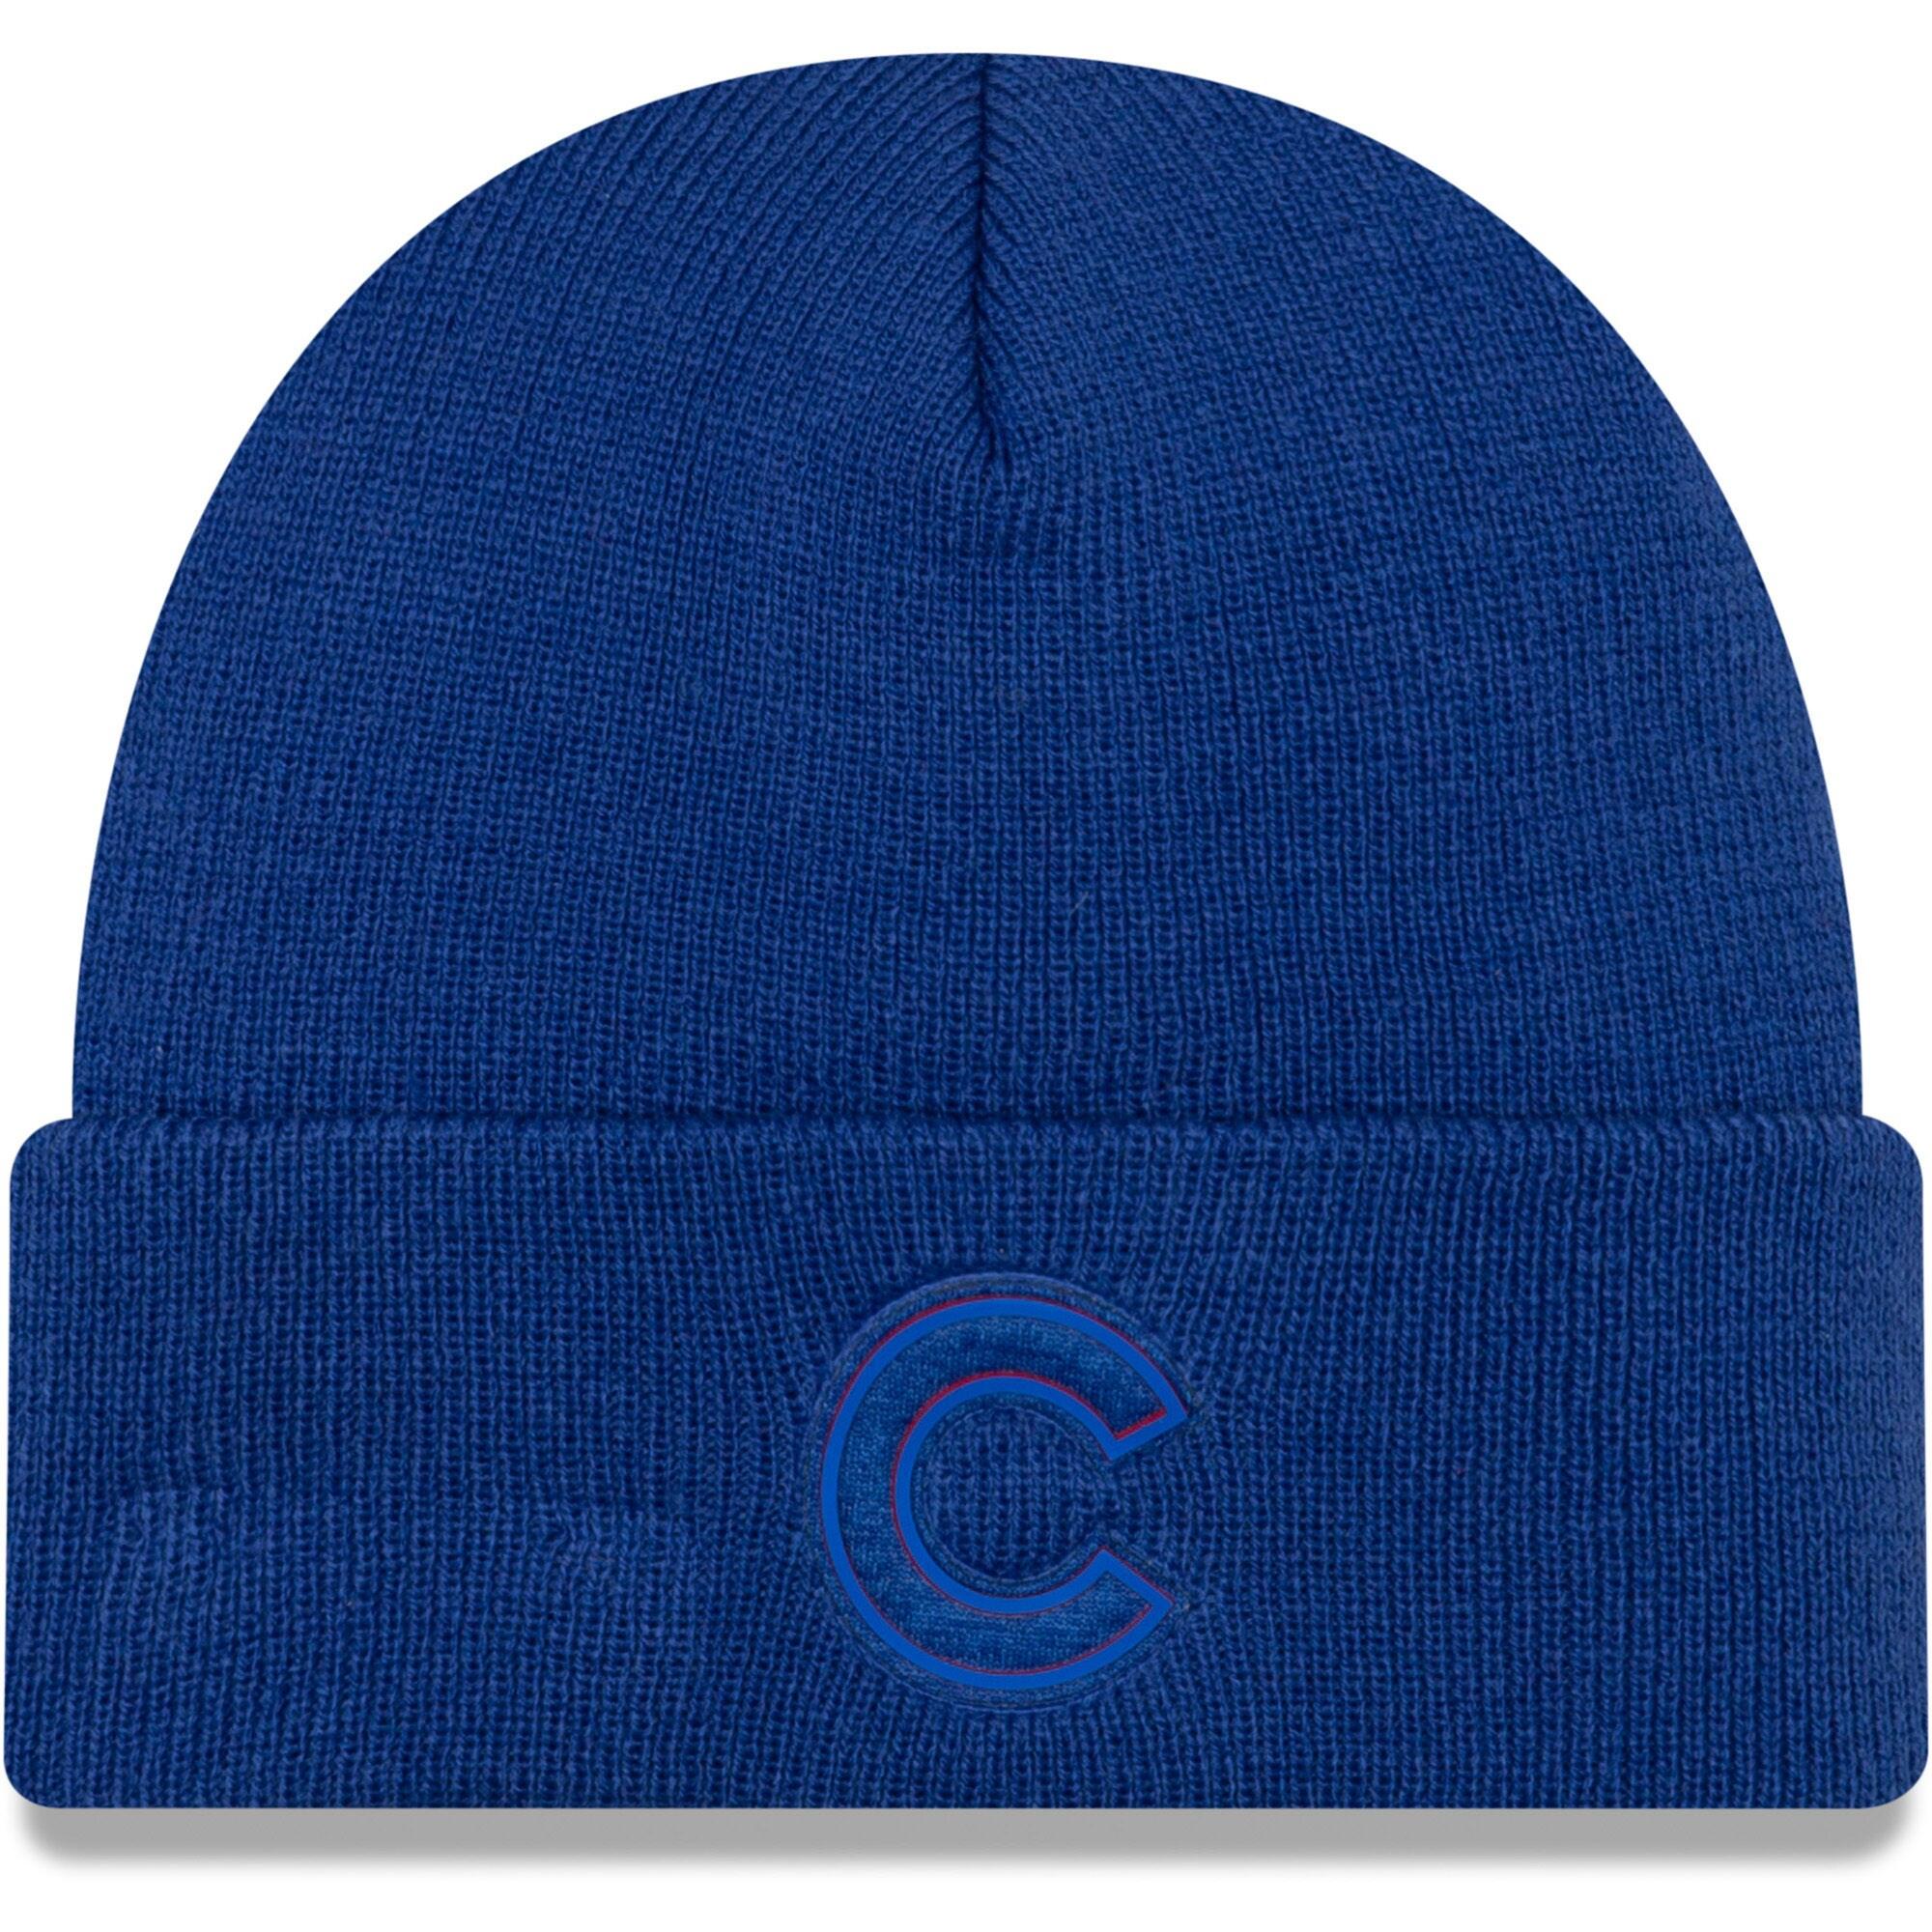 Chicago Cubs New Era Vivid Cuffed Knit Hat - Royal